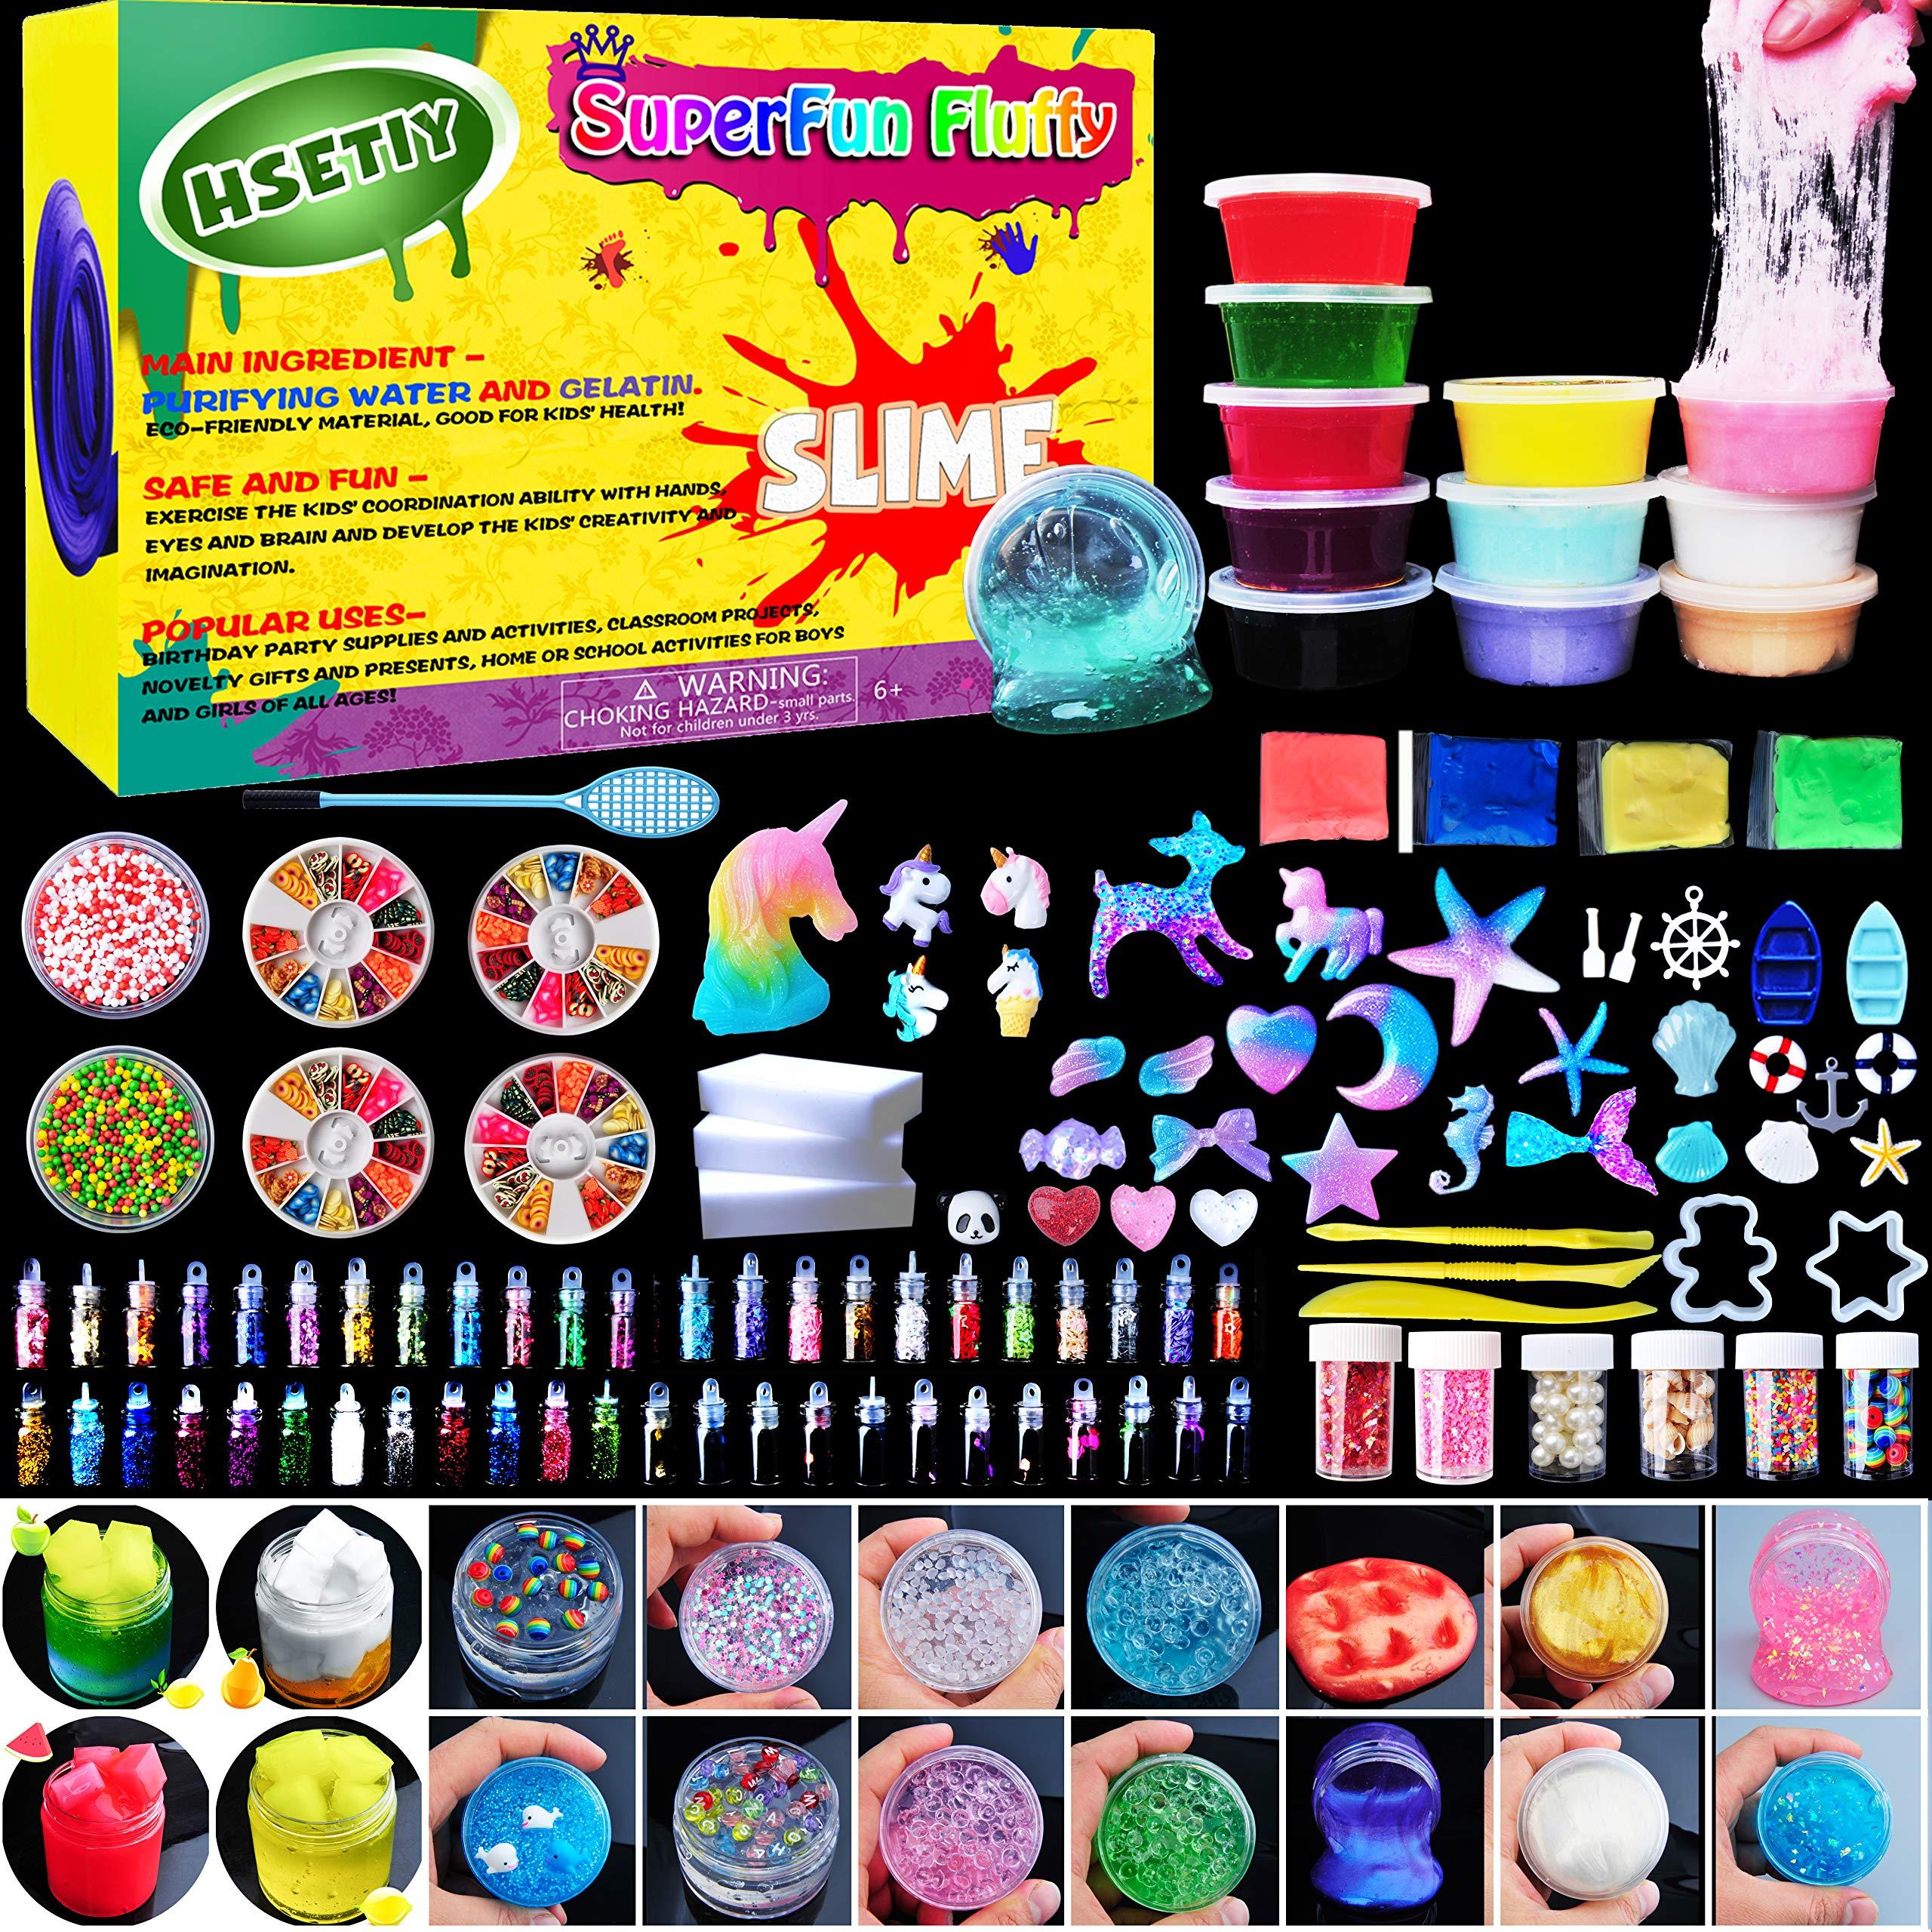 HSETIY Unicorn DIY Slime kit Supplies-6 Cloud Slime,6 Clear Slime,3 Jelly Cube,5 Unicorn,55 Glitter,4 Magic Clay with DIY Slime Tool and Slime Box